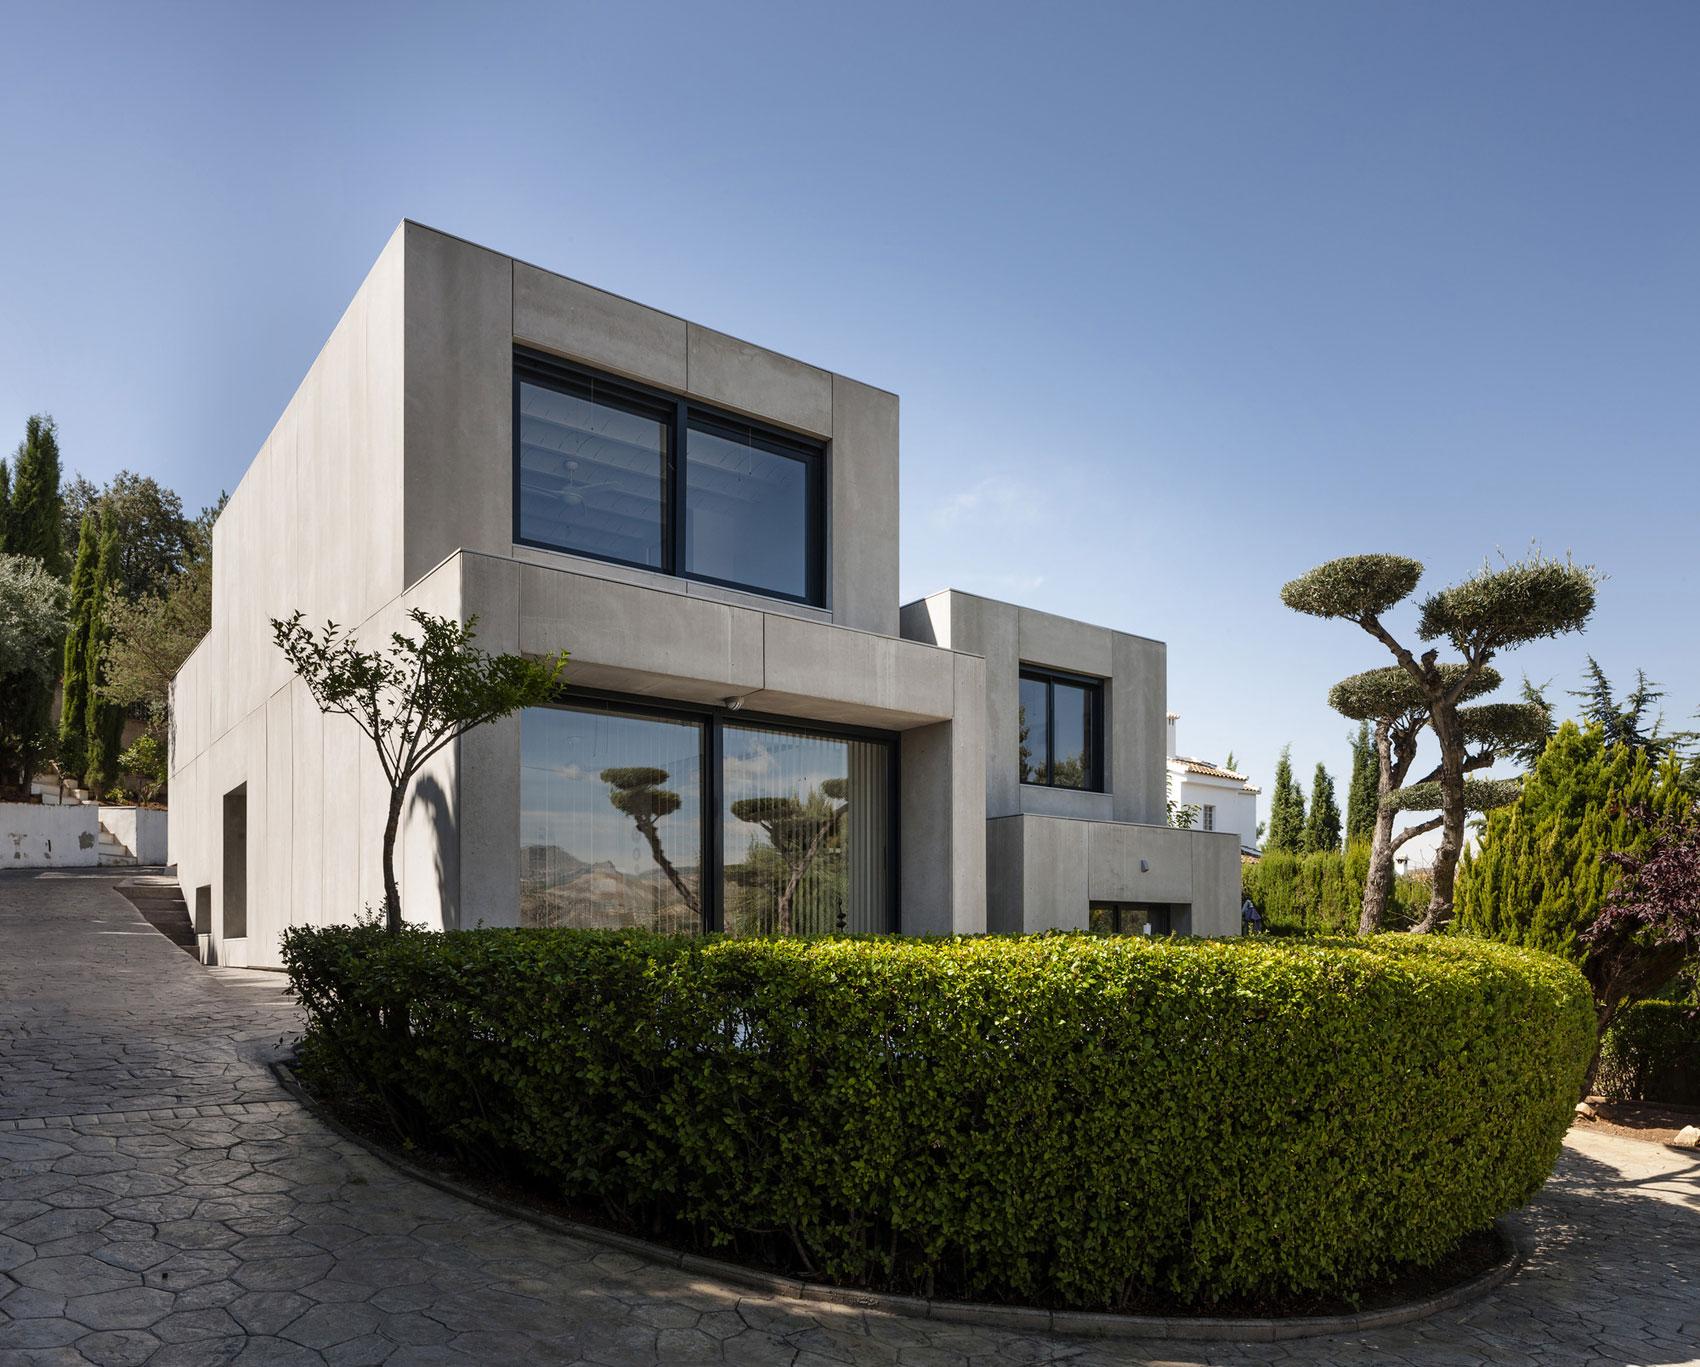 Minimalist Contemporary House In Spain Homedezen